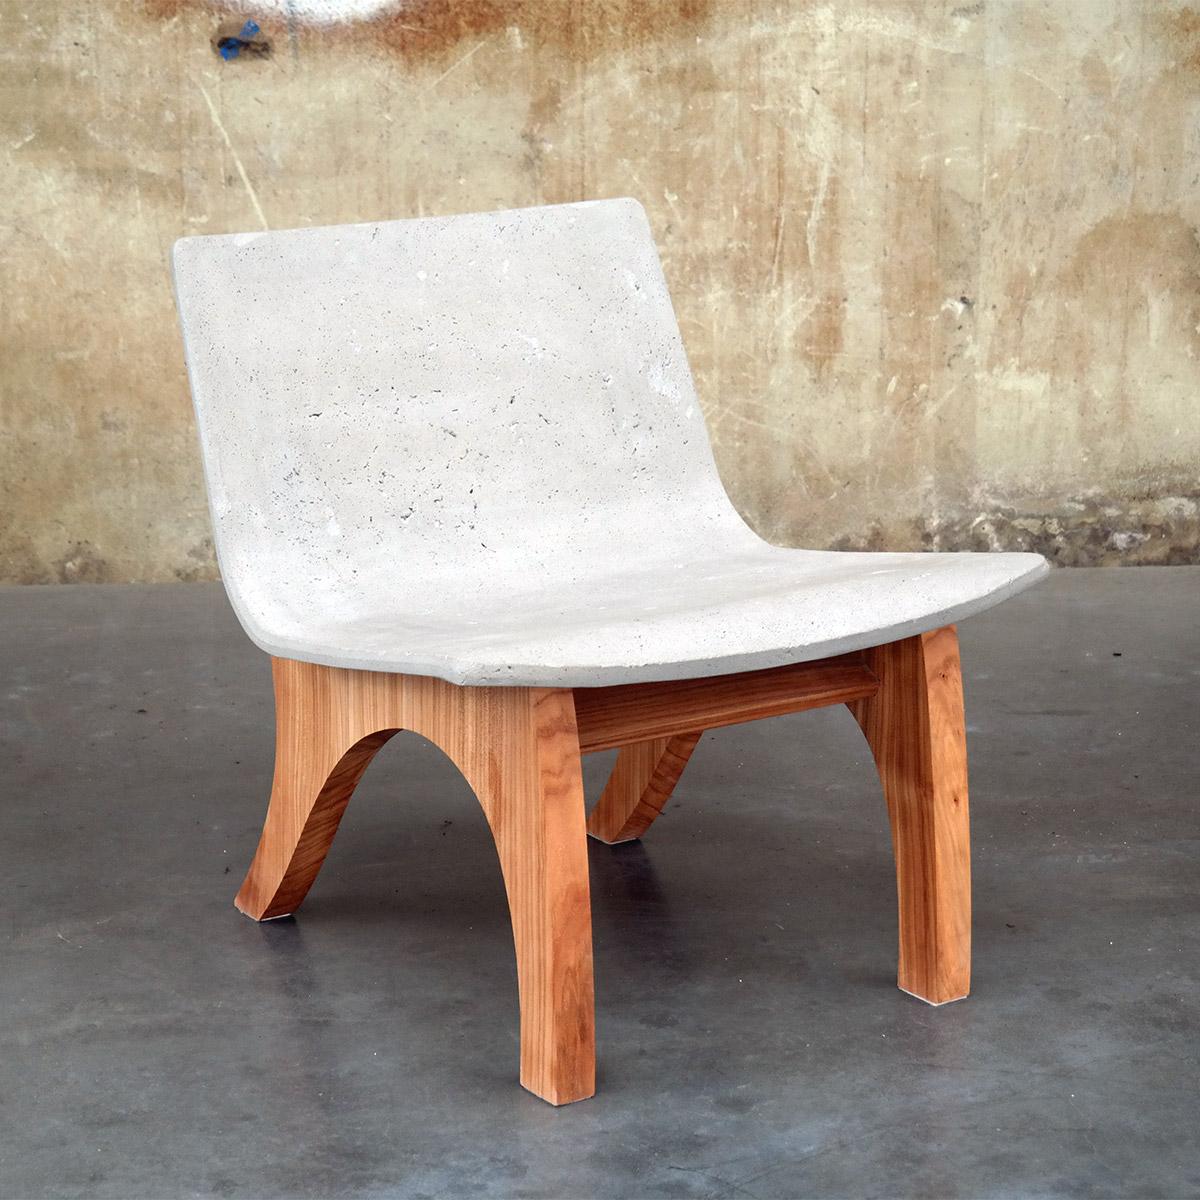 Morgan-concrete-chair-front